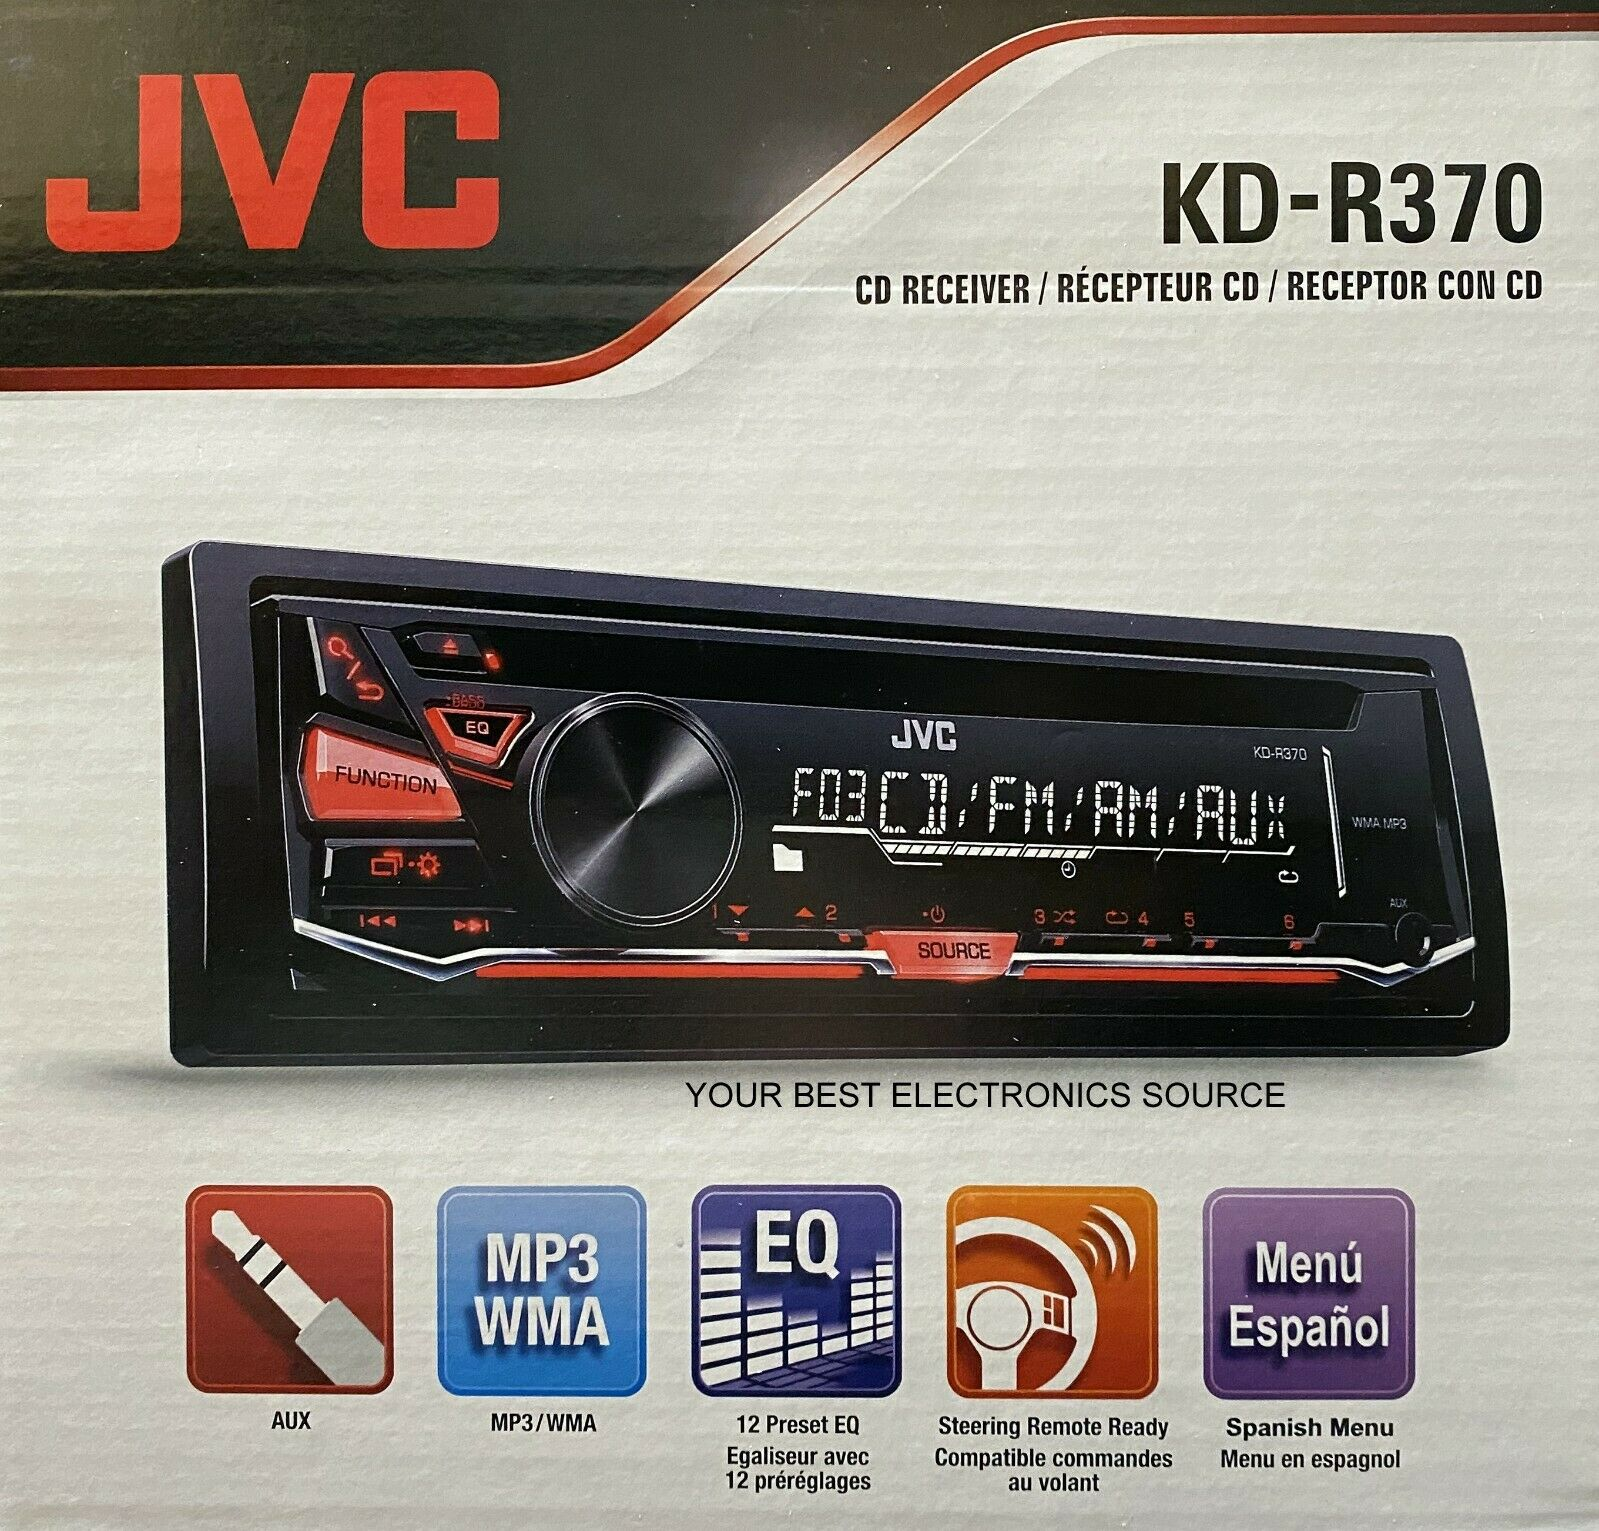 NEW JVC KD-R370 AM/FM/CD Single DIN Car Stereo Receiver w/ A